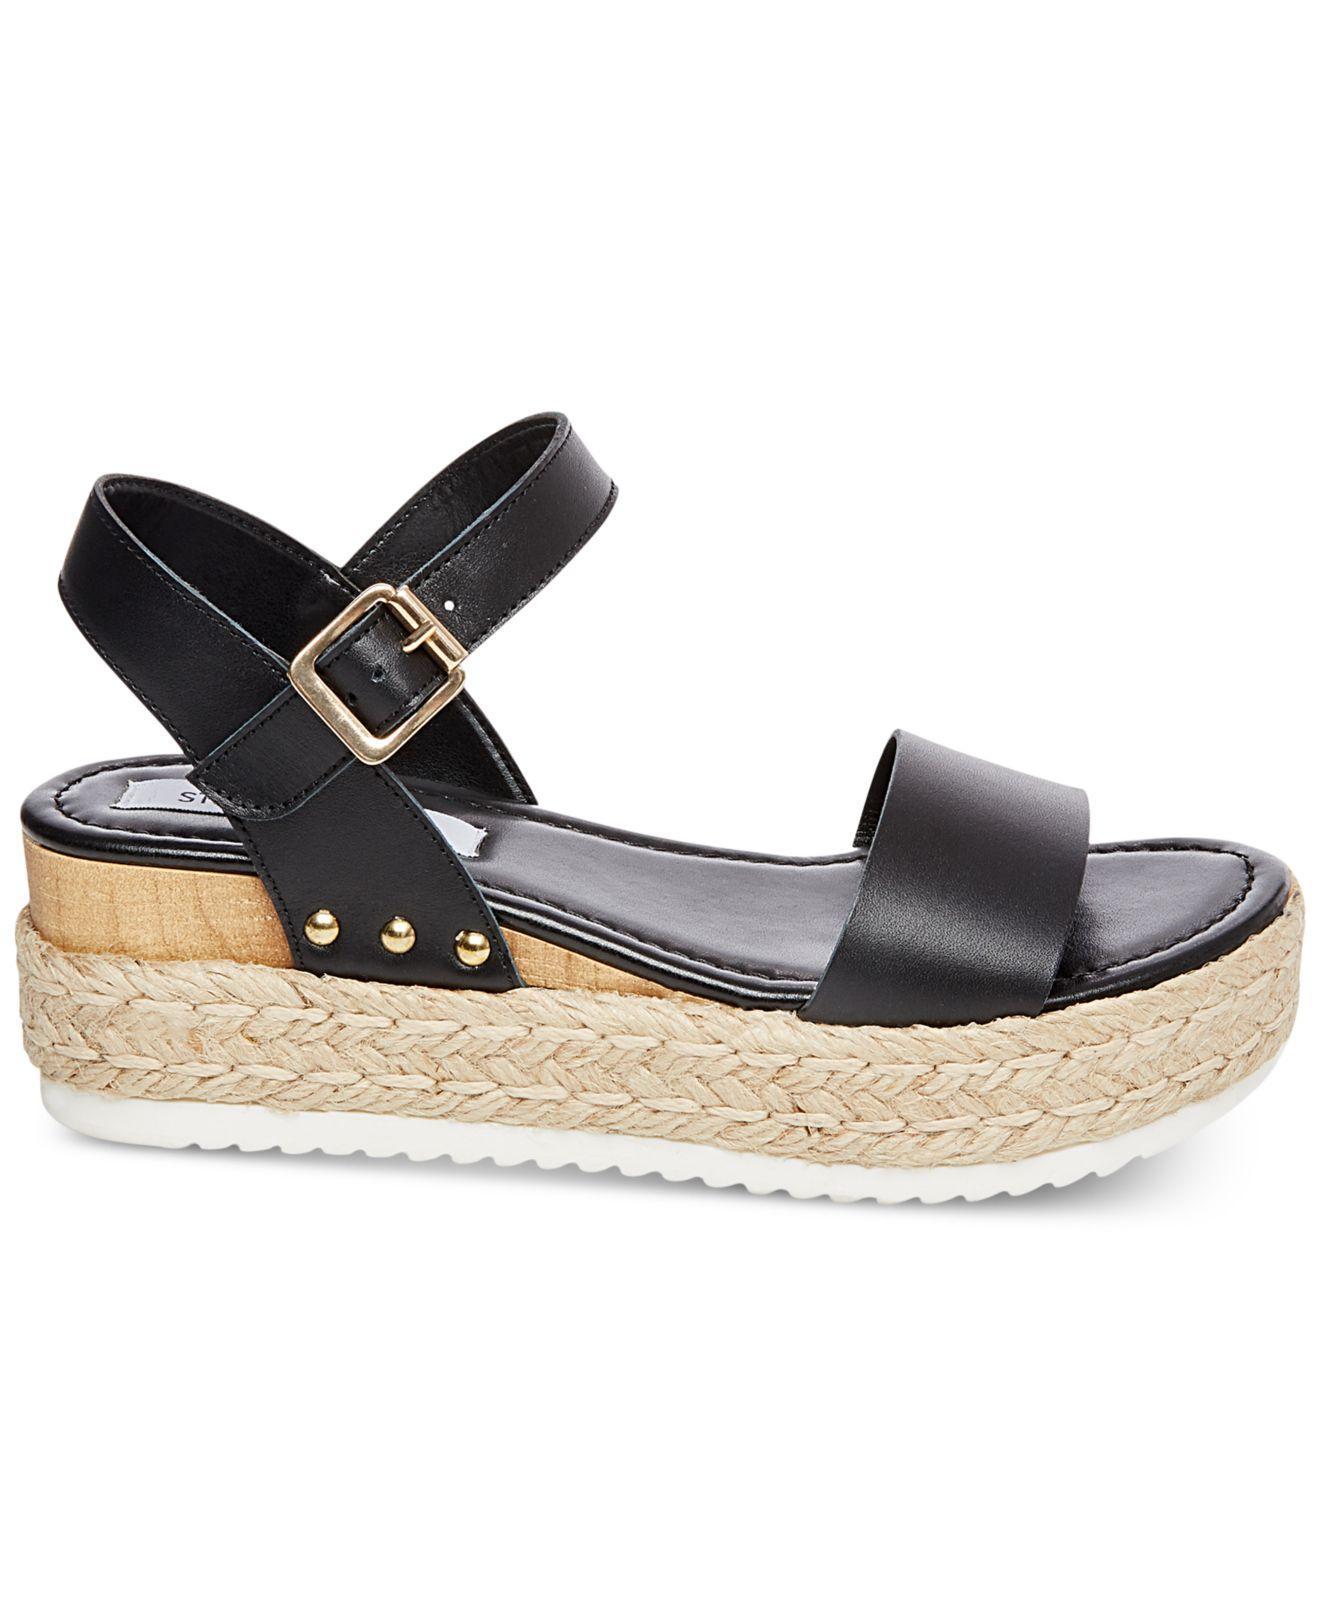 22e1b088259 Women's Black Chiara Flatform Espadrille Sandals